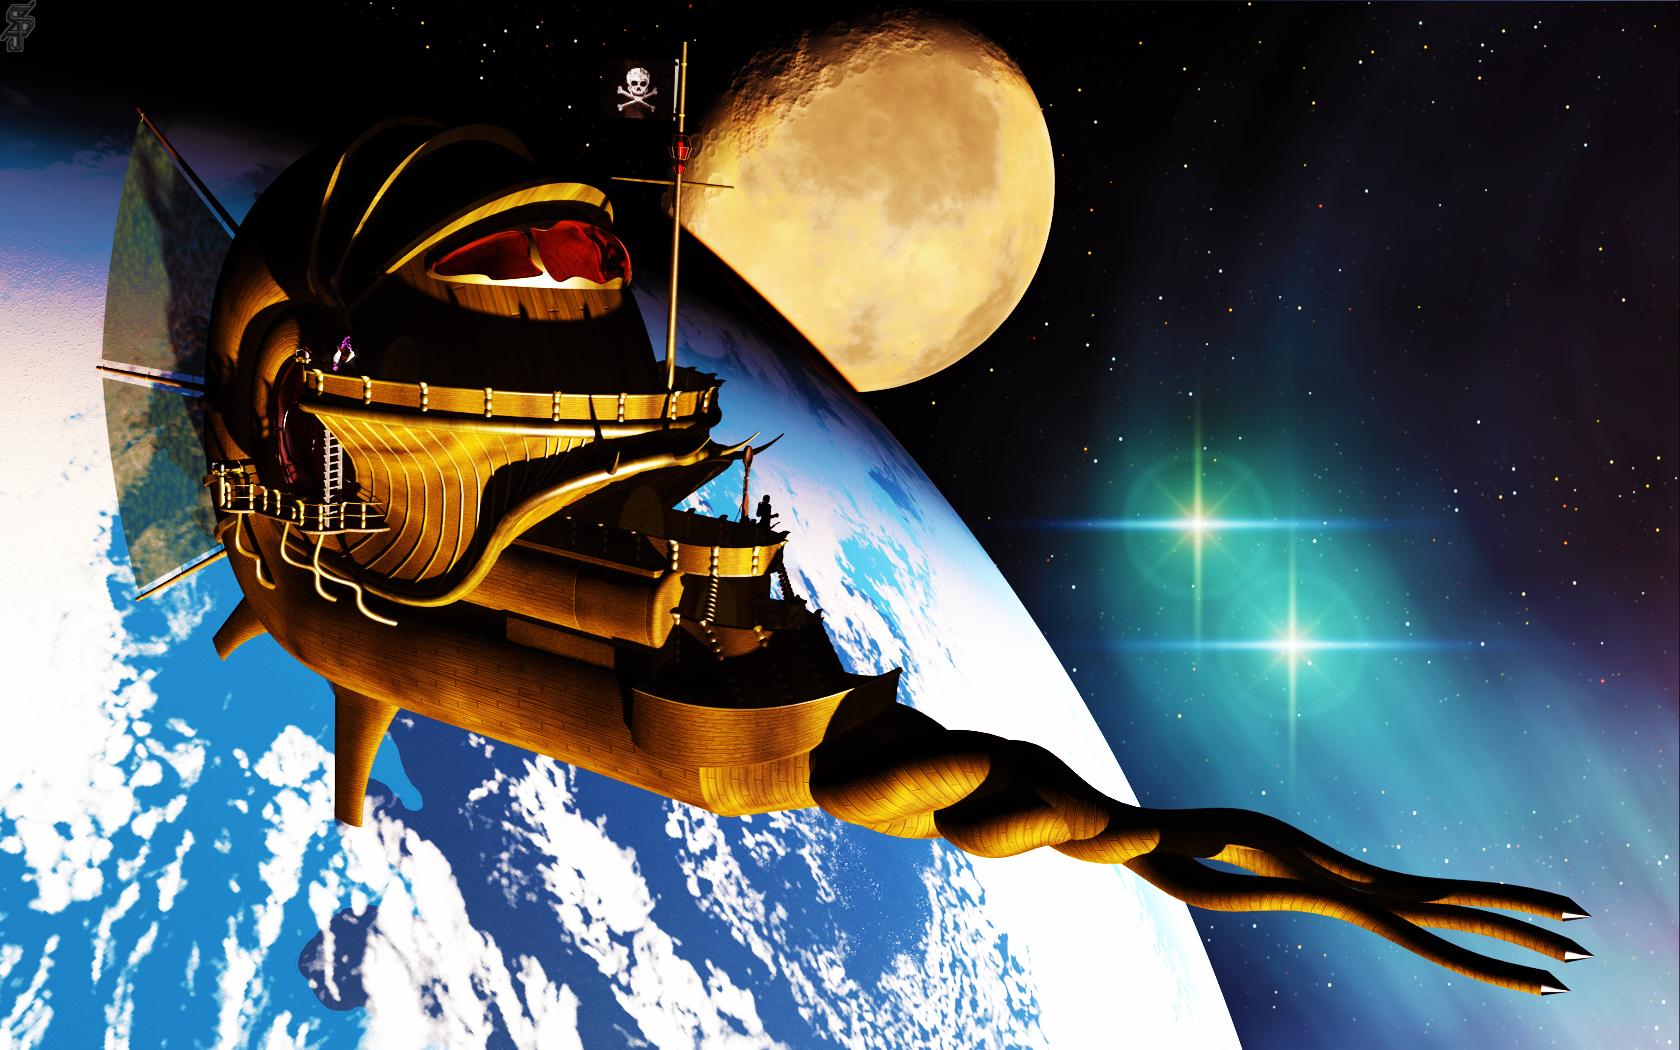 Sj nautiloid planet by silverbladete d5gh0n2